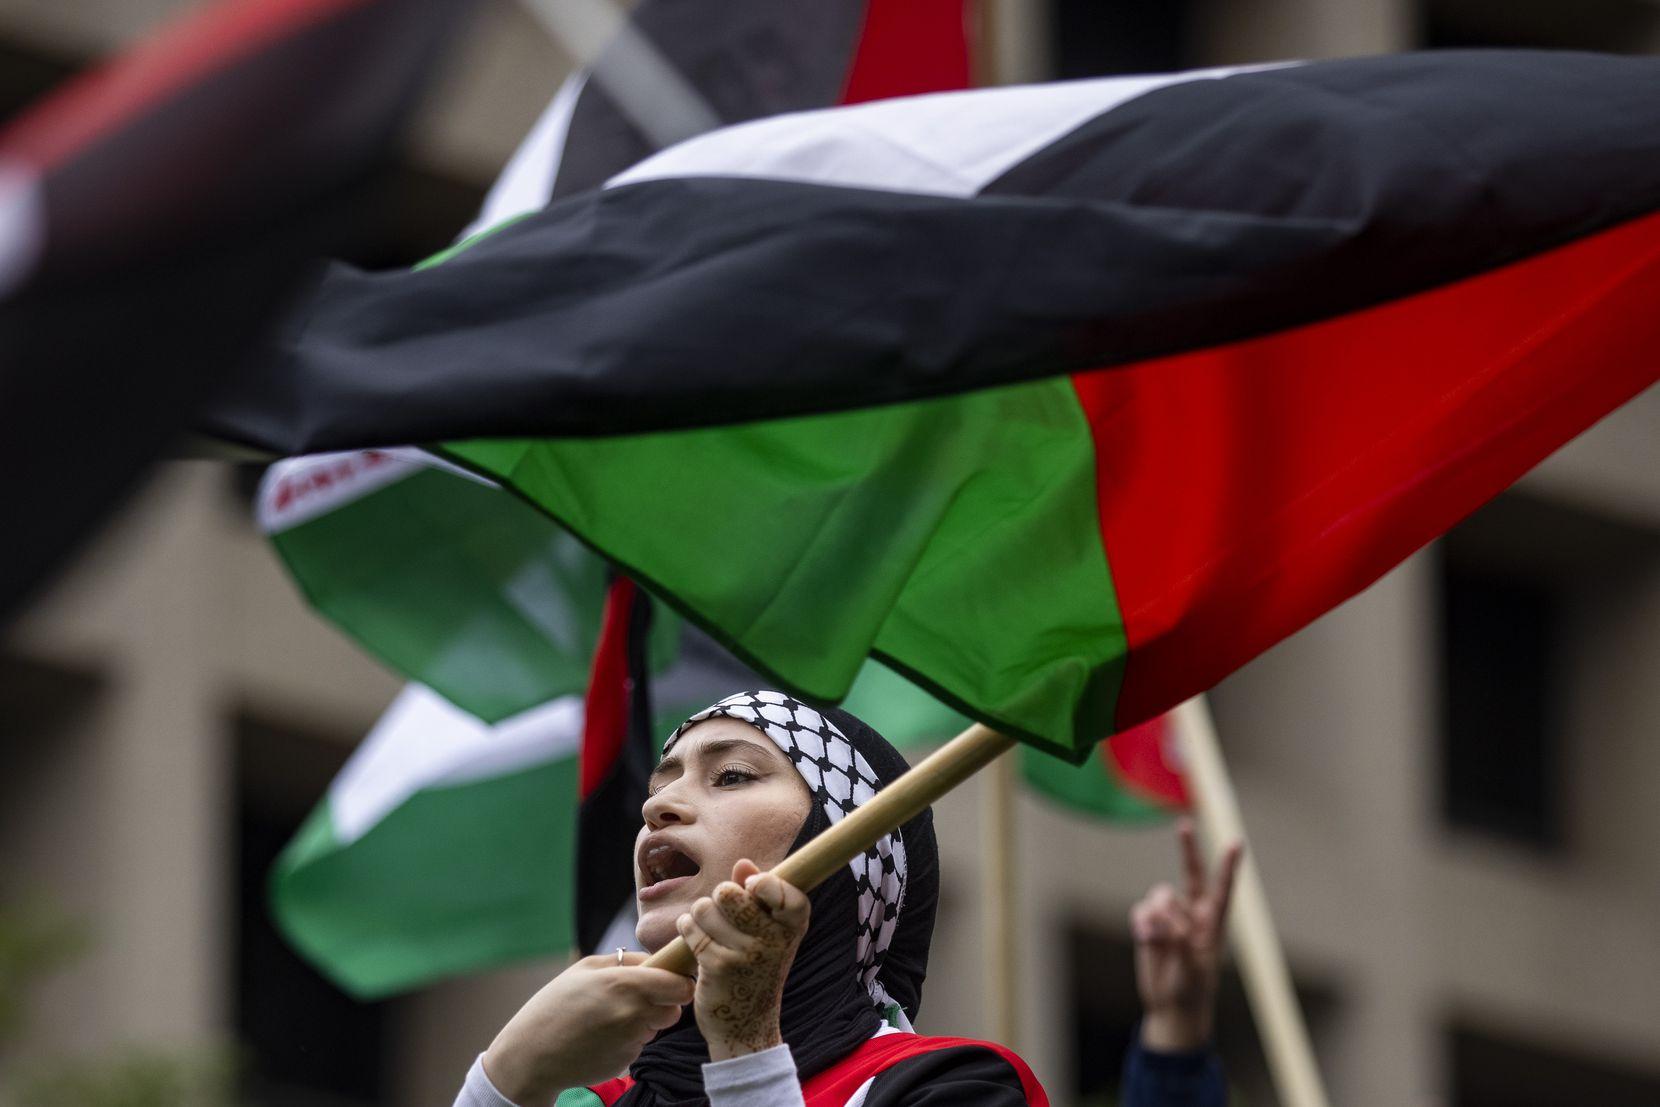 Najah Hamdan brought a Palestinian flag for the rally.